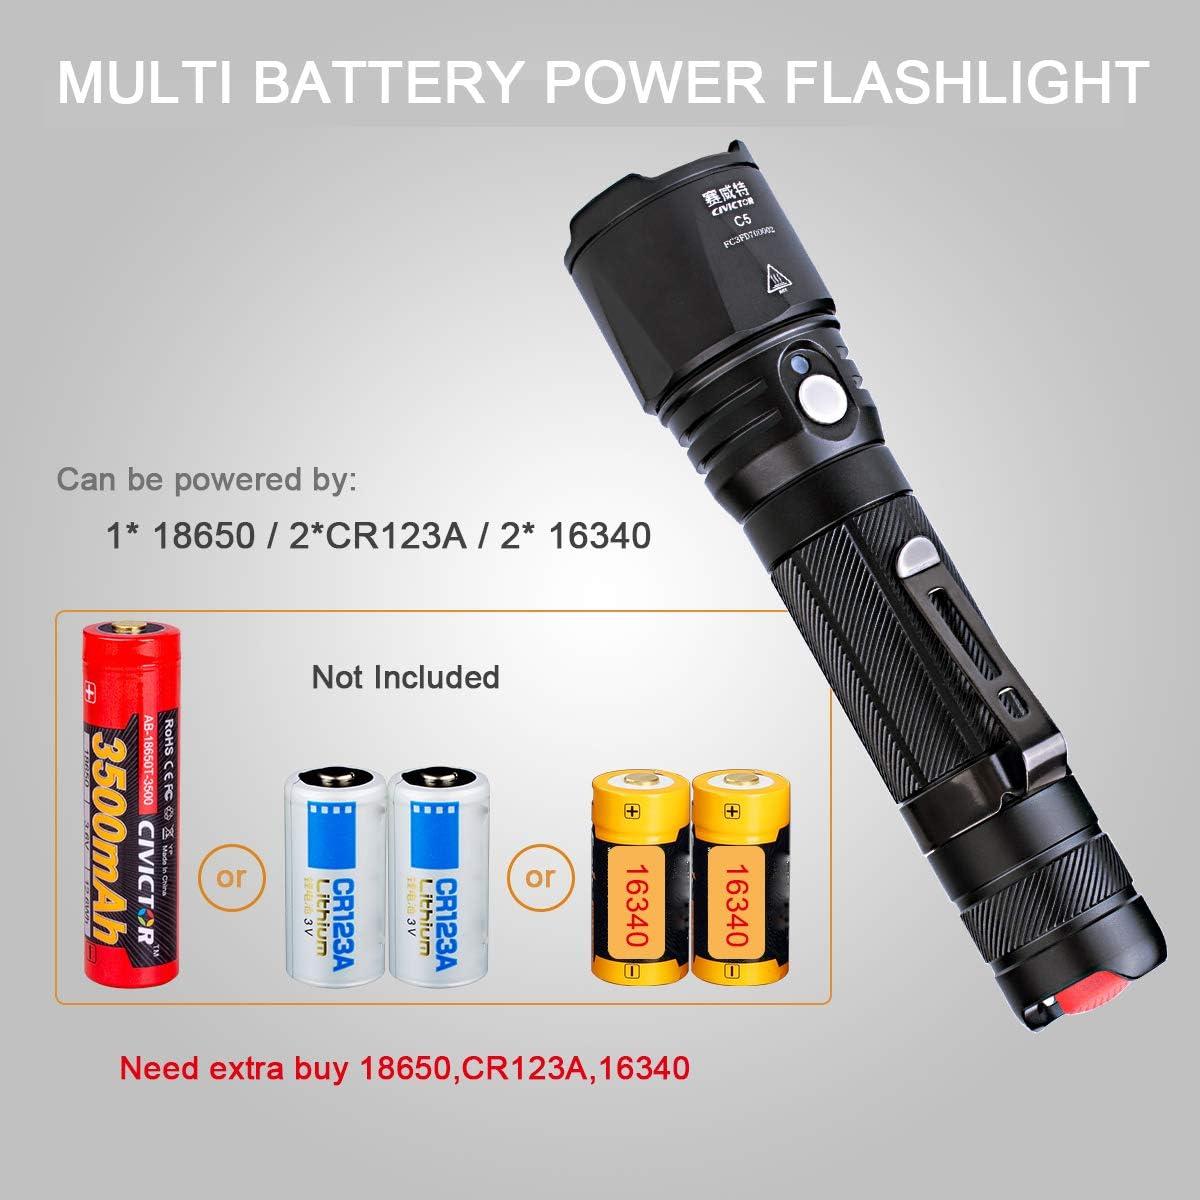 LED Tactical Flashlight Military Grade Torch Super Bright Handheld Light Supply